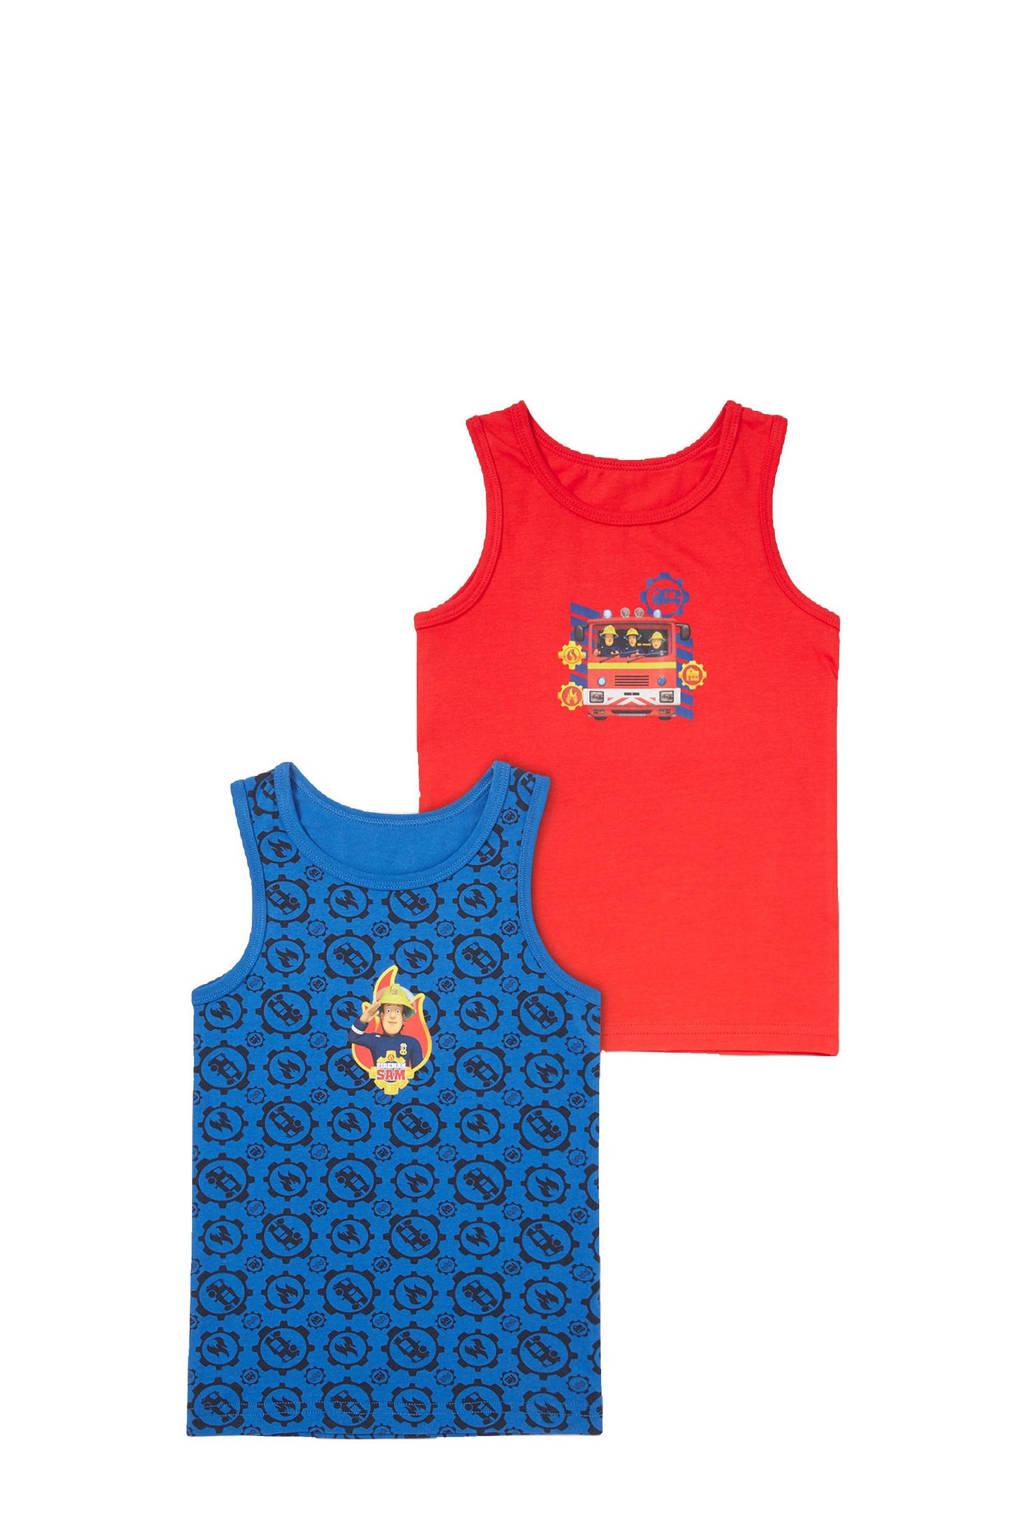 C&A Here & There Brandweerman Sam hemd - set van 2 blauw/rood, Rood/blauw